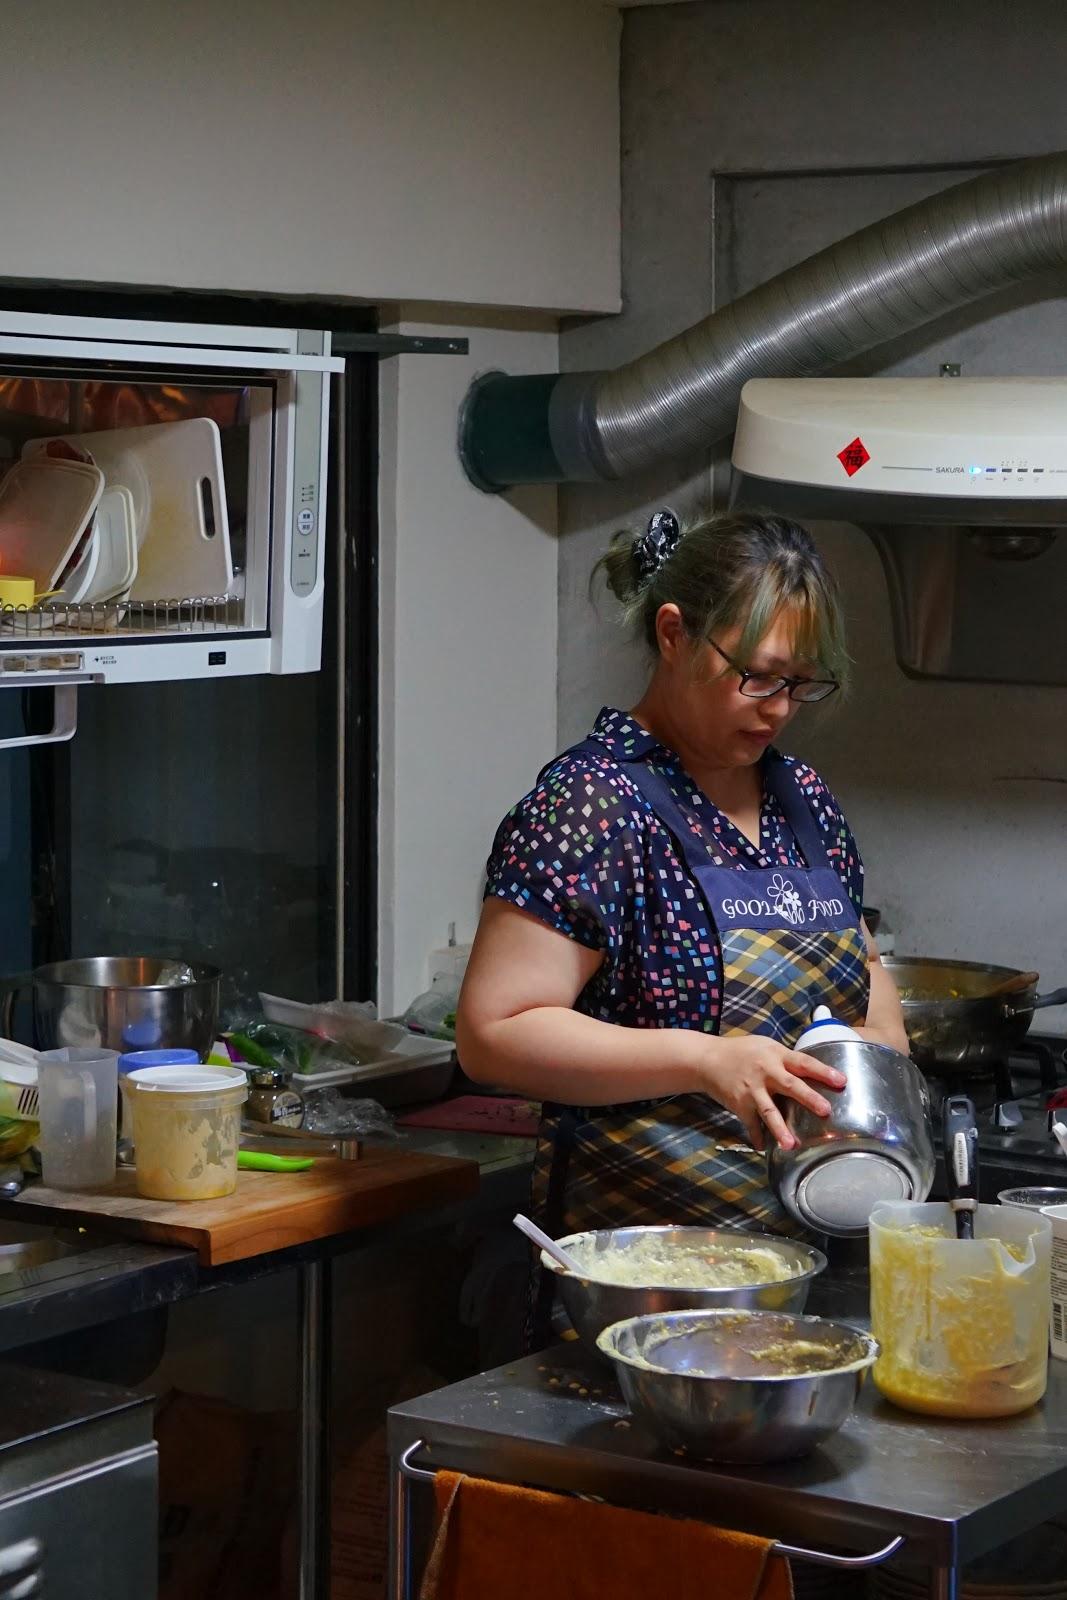 IMG_3625-beautyanxiety.com-hualien-desserts-woodstock-pancake